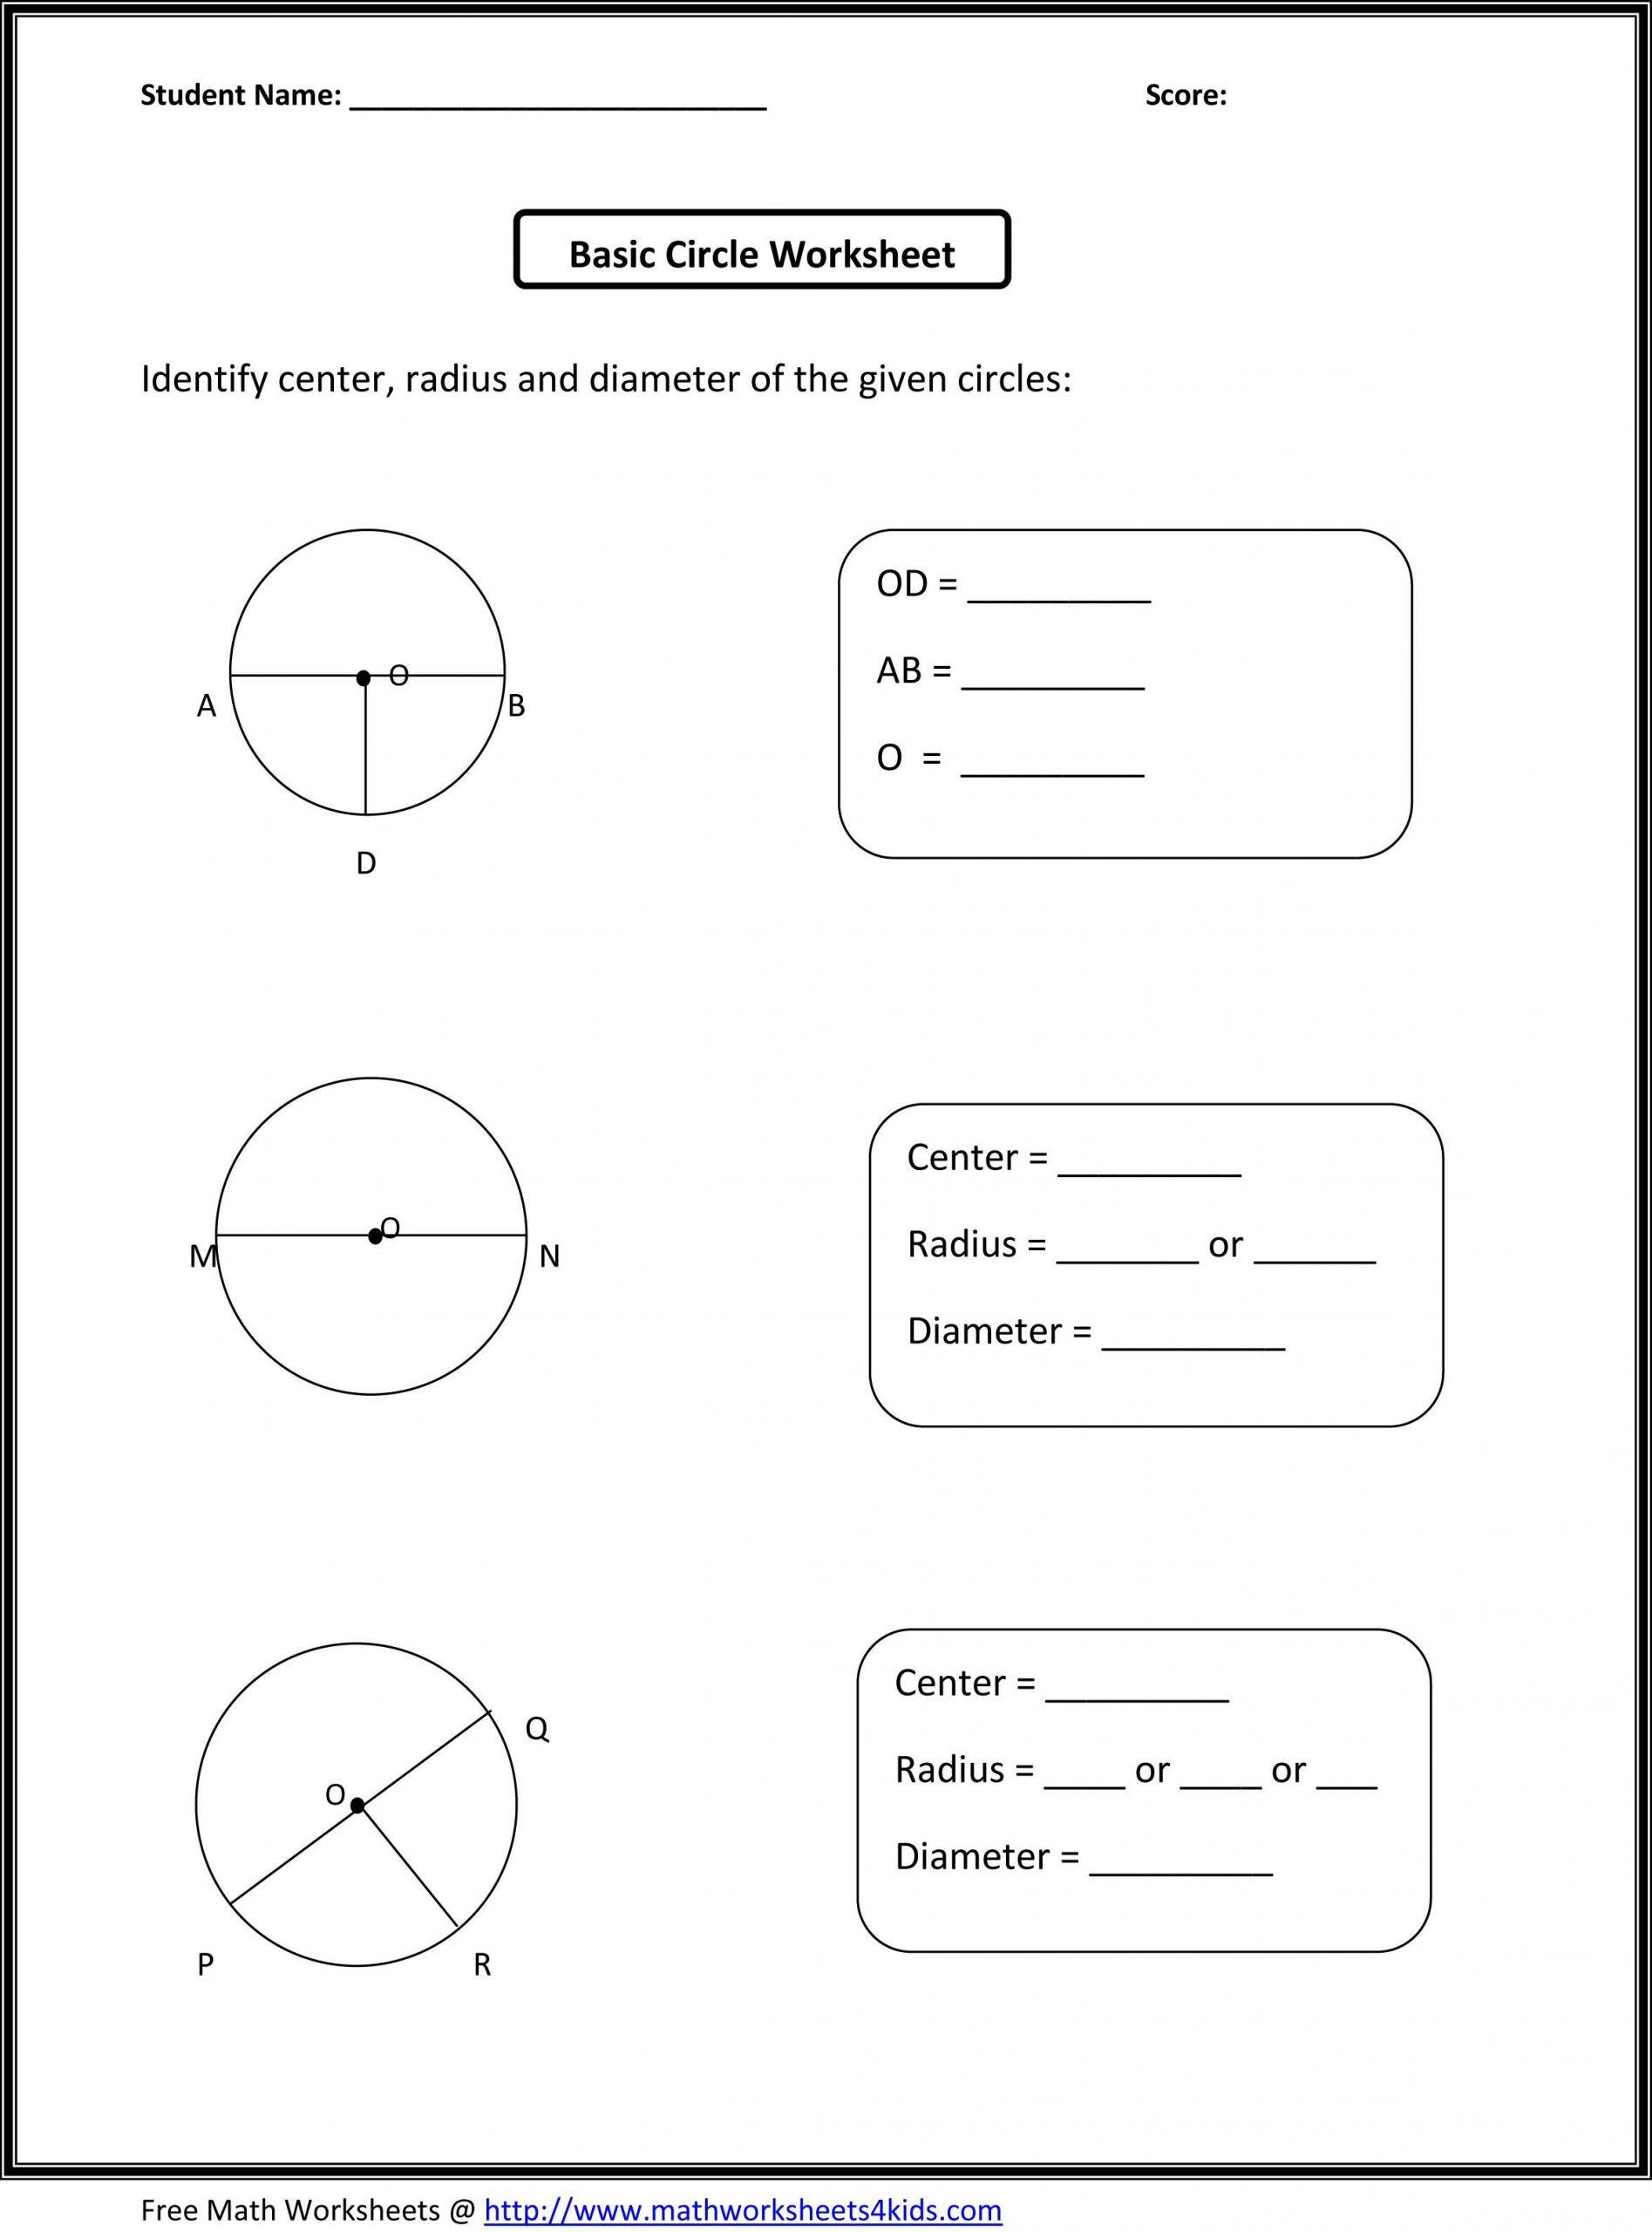 3rd Grade Geometry Worksheets 4 3rd Grade Geometry Worksheets Worksheets